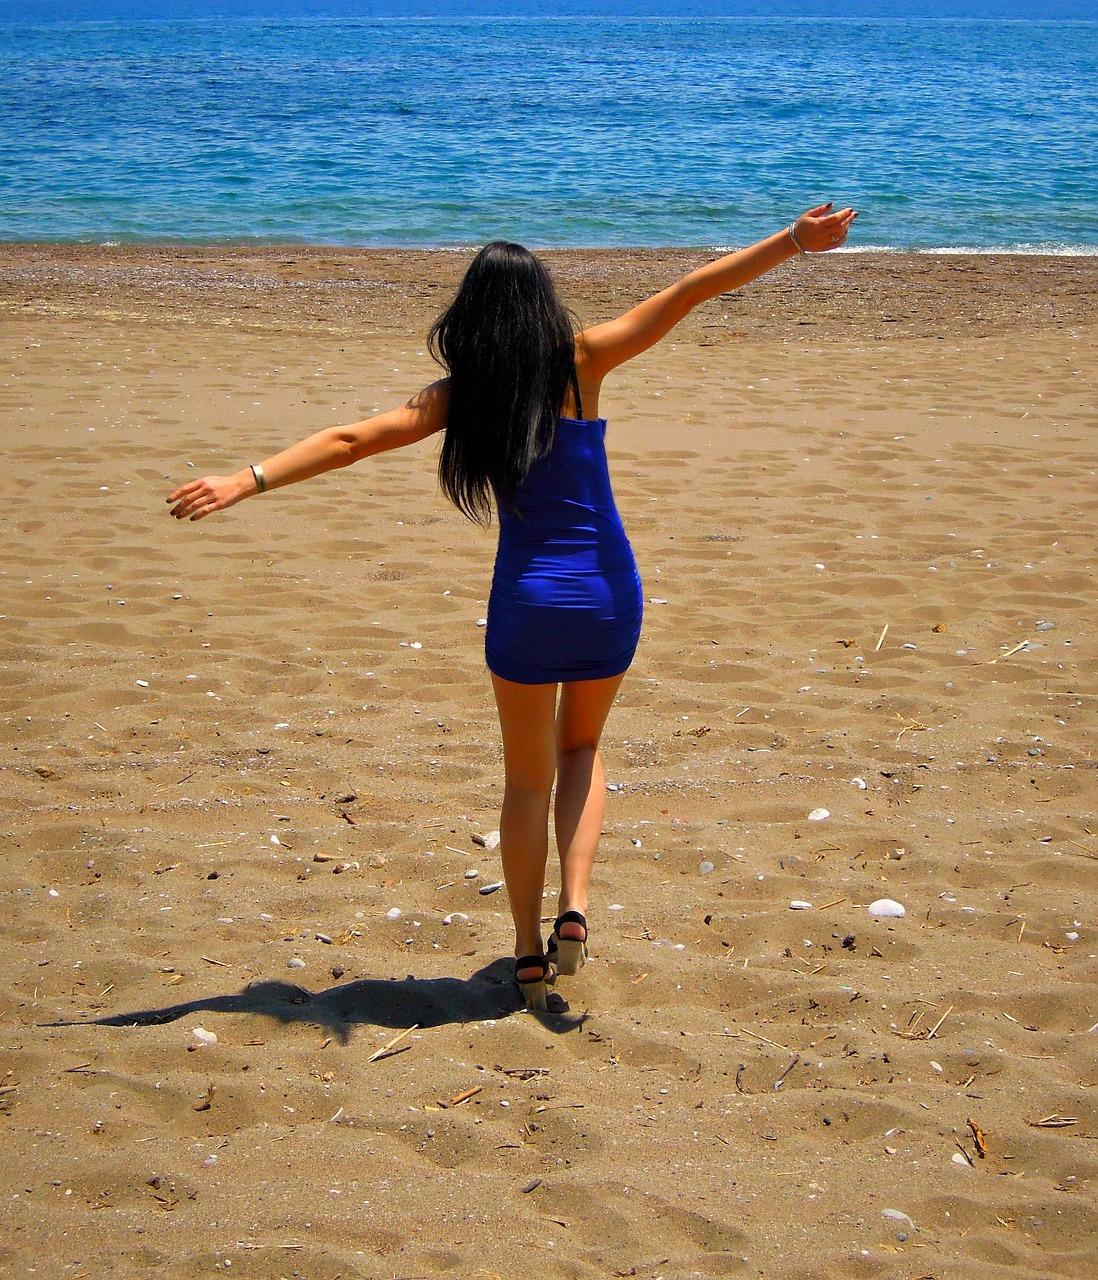 Картинки девушки брюнетки на море со спины